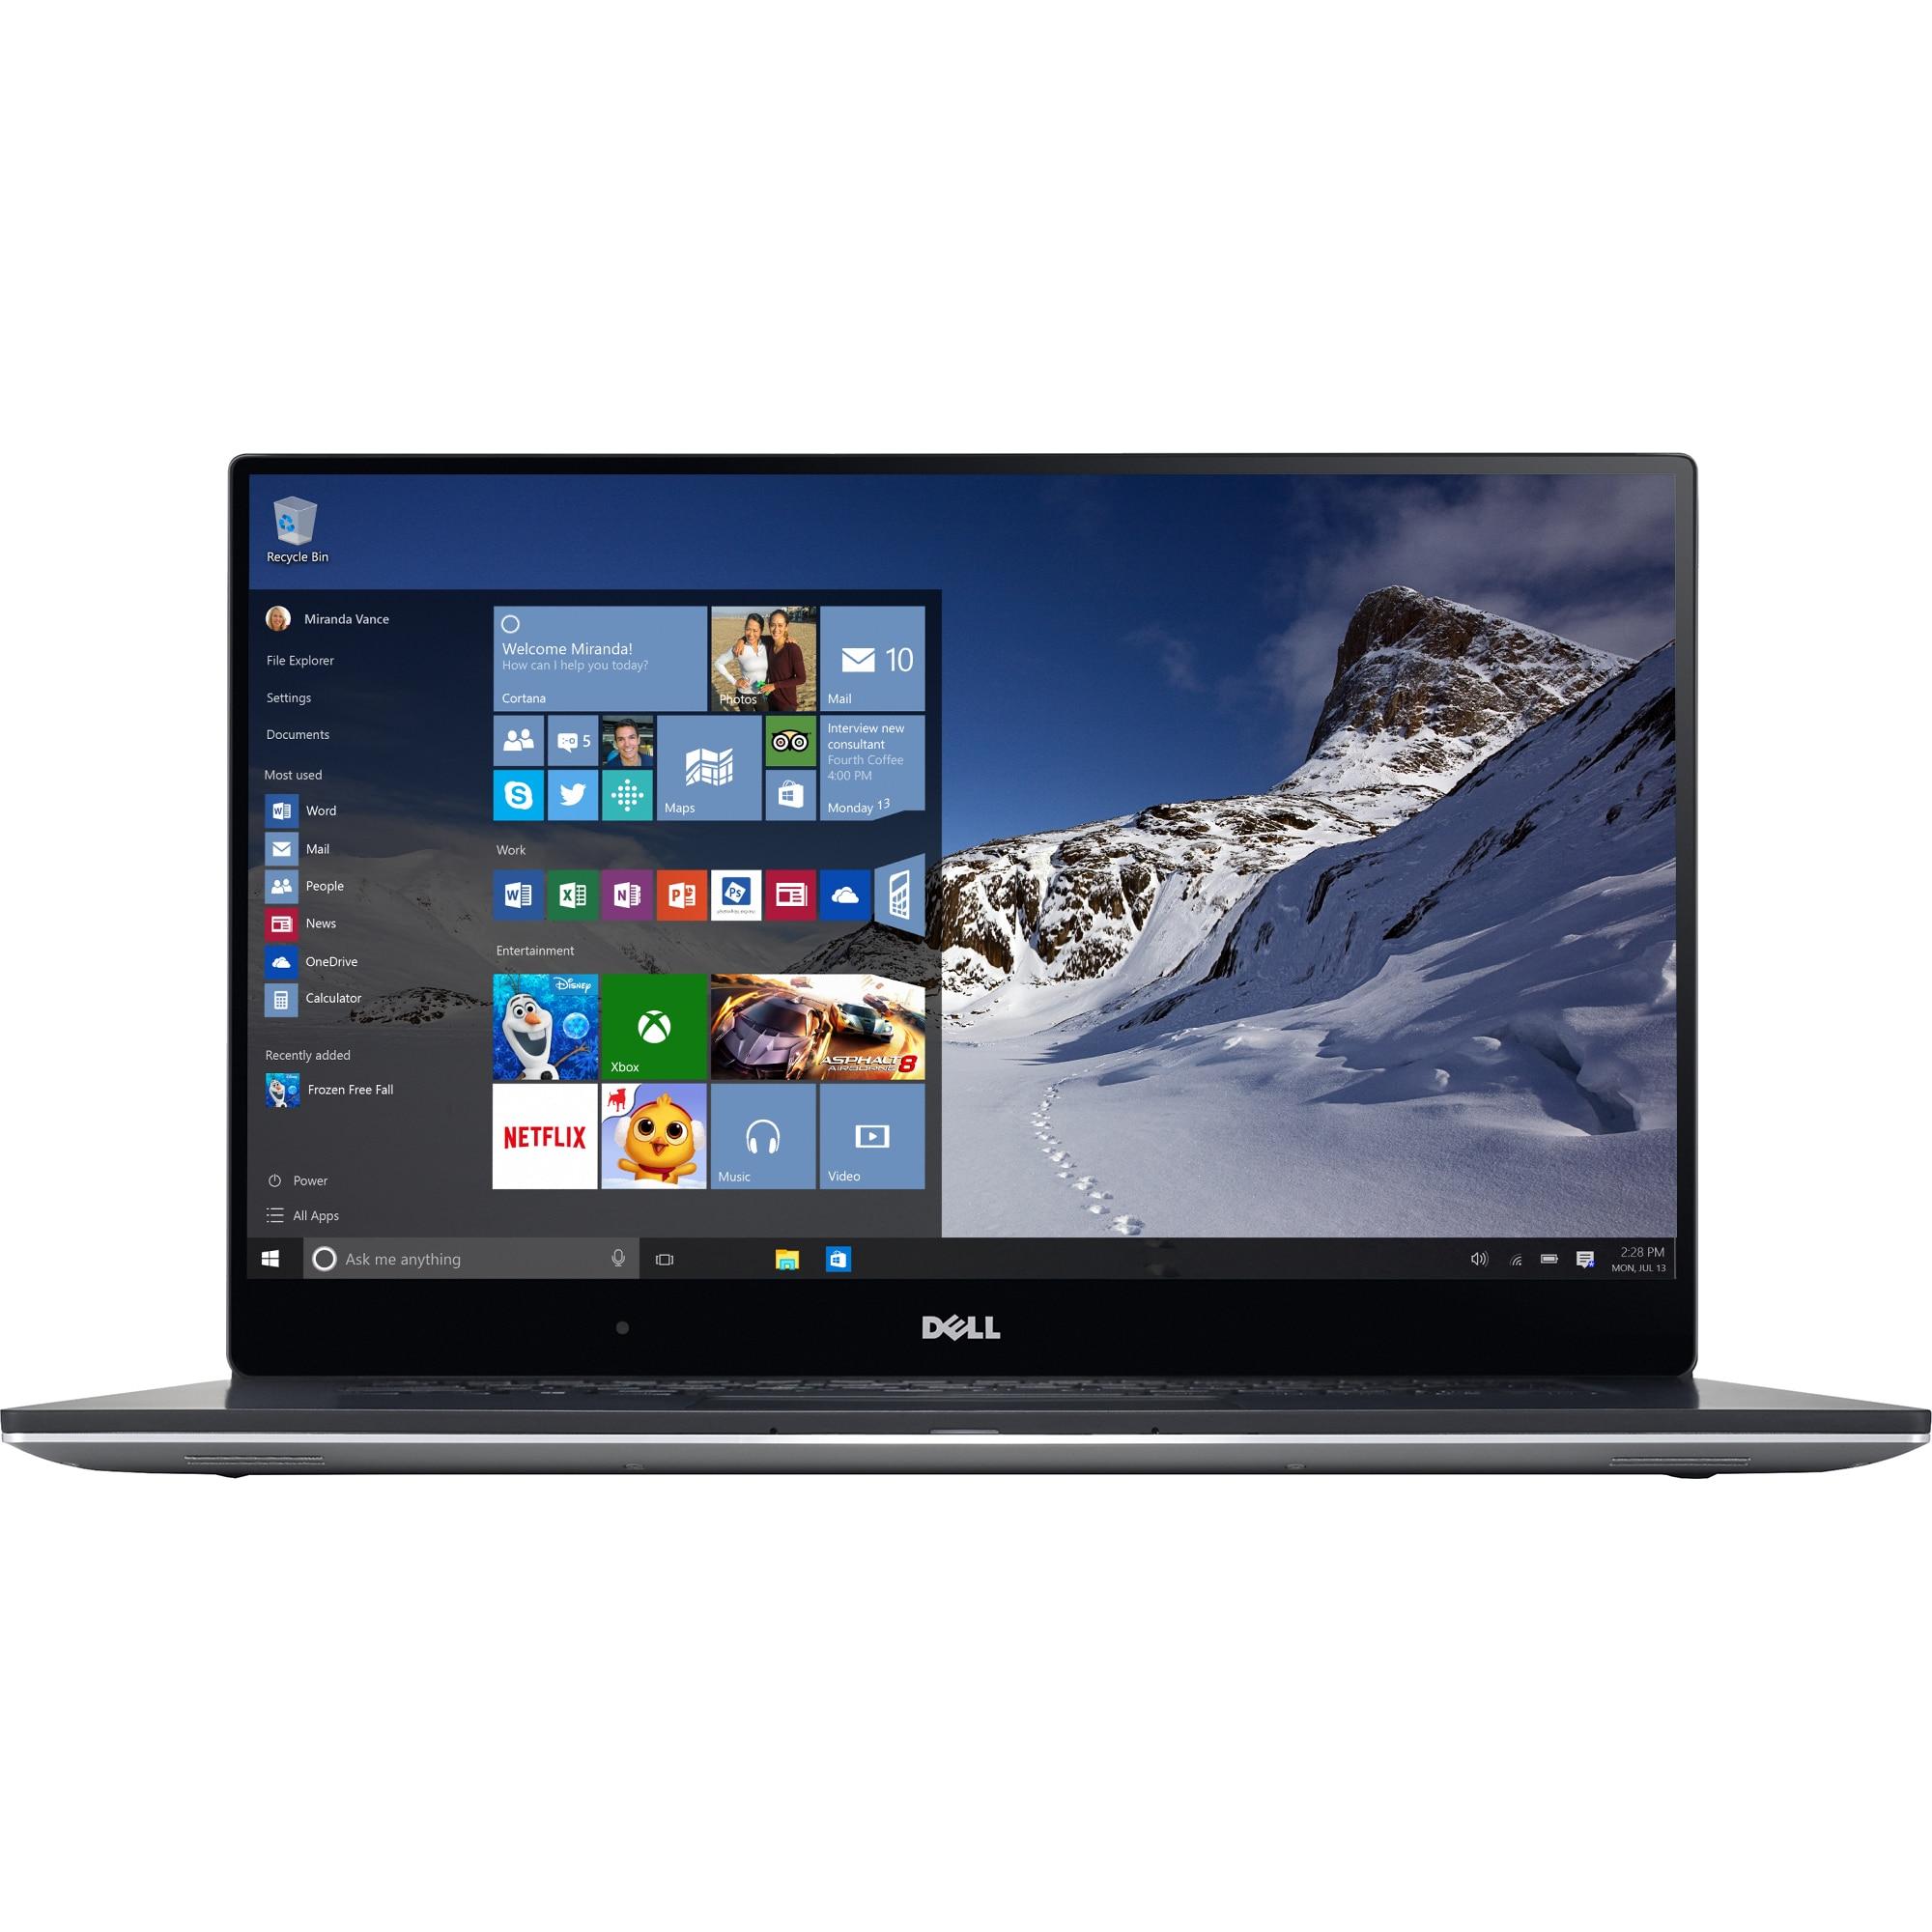 "Fotografie Ultrabook Dell New XPS 15 9560 cu procesor Intel® Core™ i7-7700HQ 2.80 GHz, Kaby Lake, 15.6"", UHD, Touchscreen, InfinityEdge, 16GB, 1TB SSD, nVIDIA GeForce GTX 1050 4GB, Microsoft Windows 10 Pro, Silver"